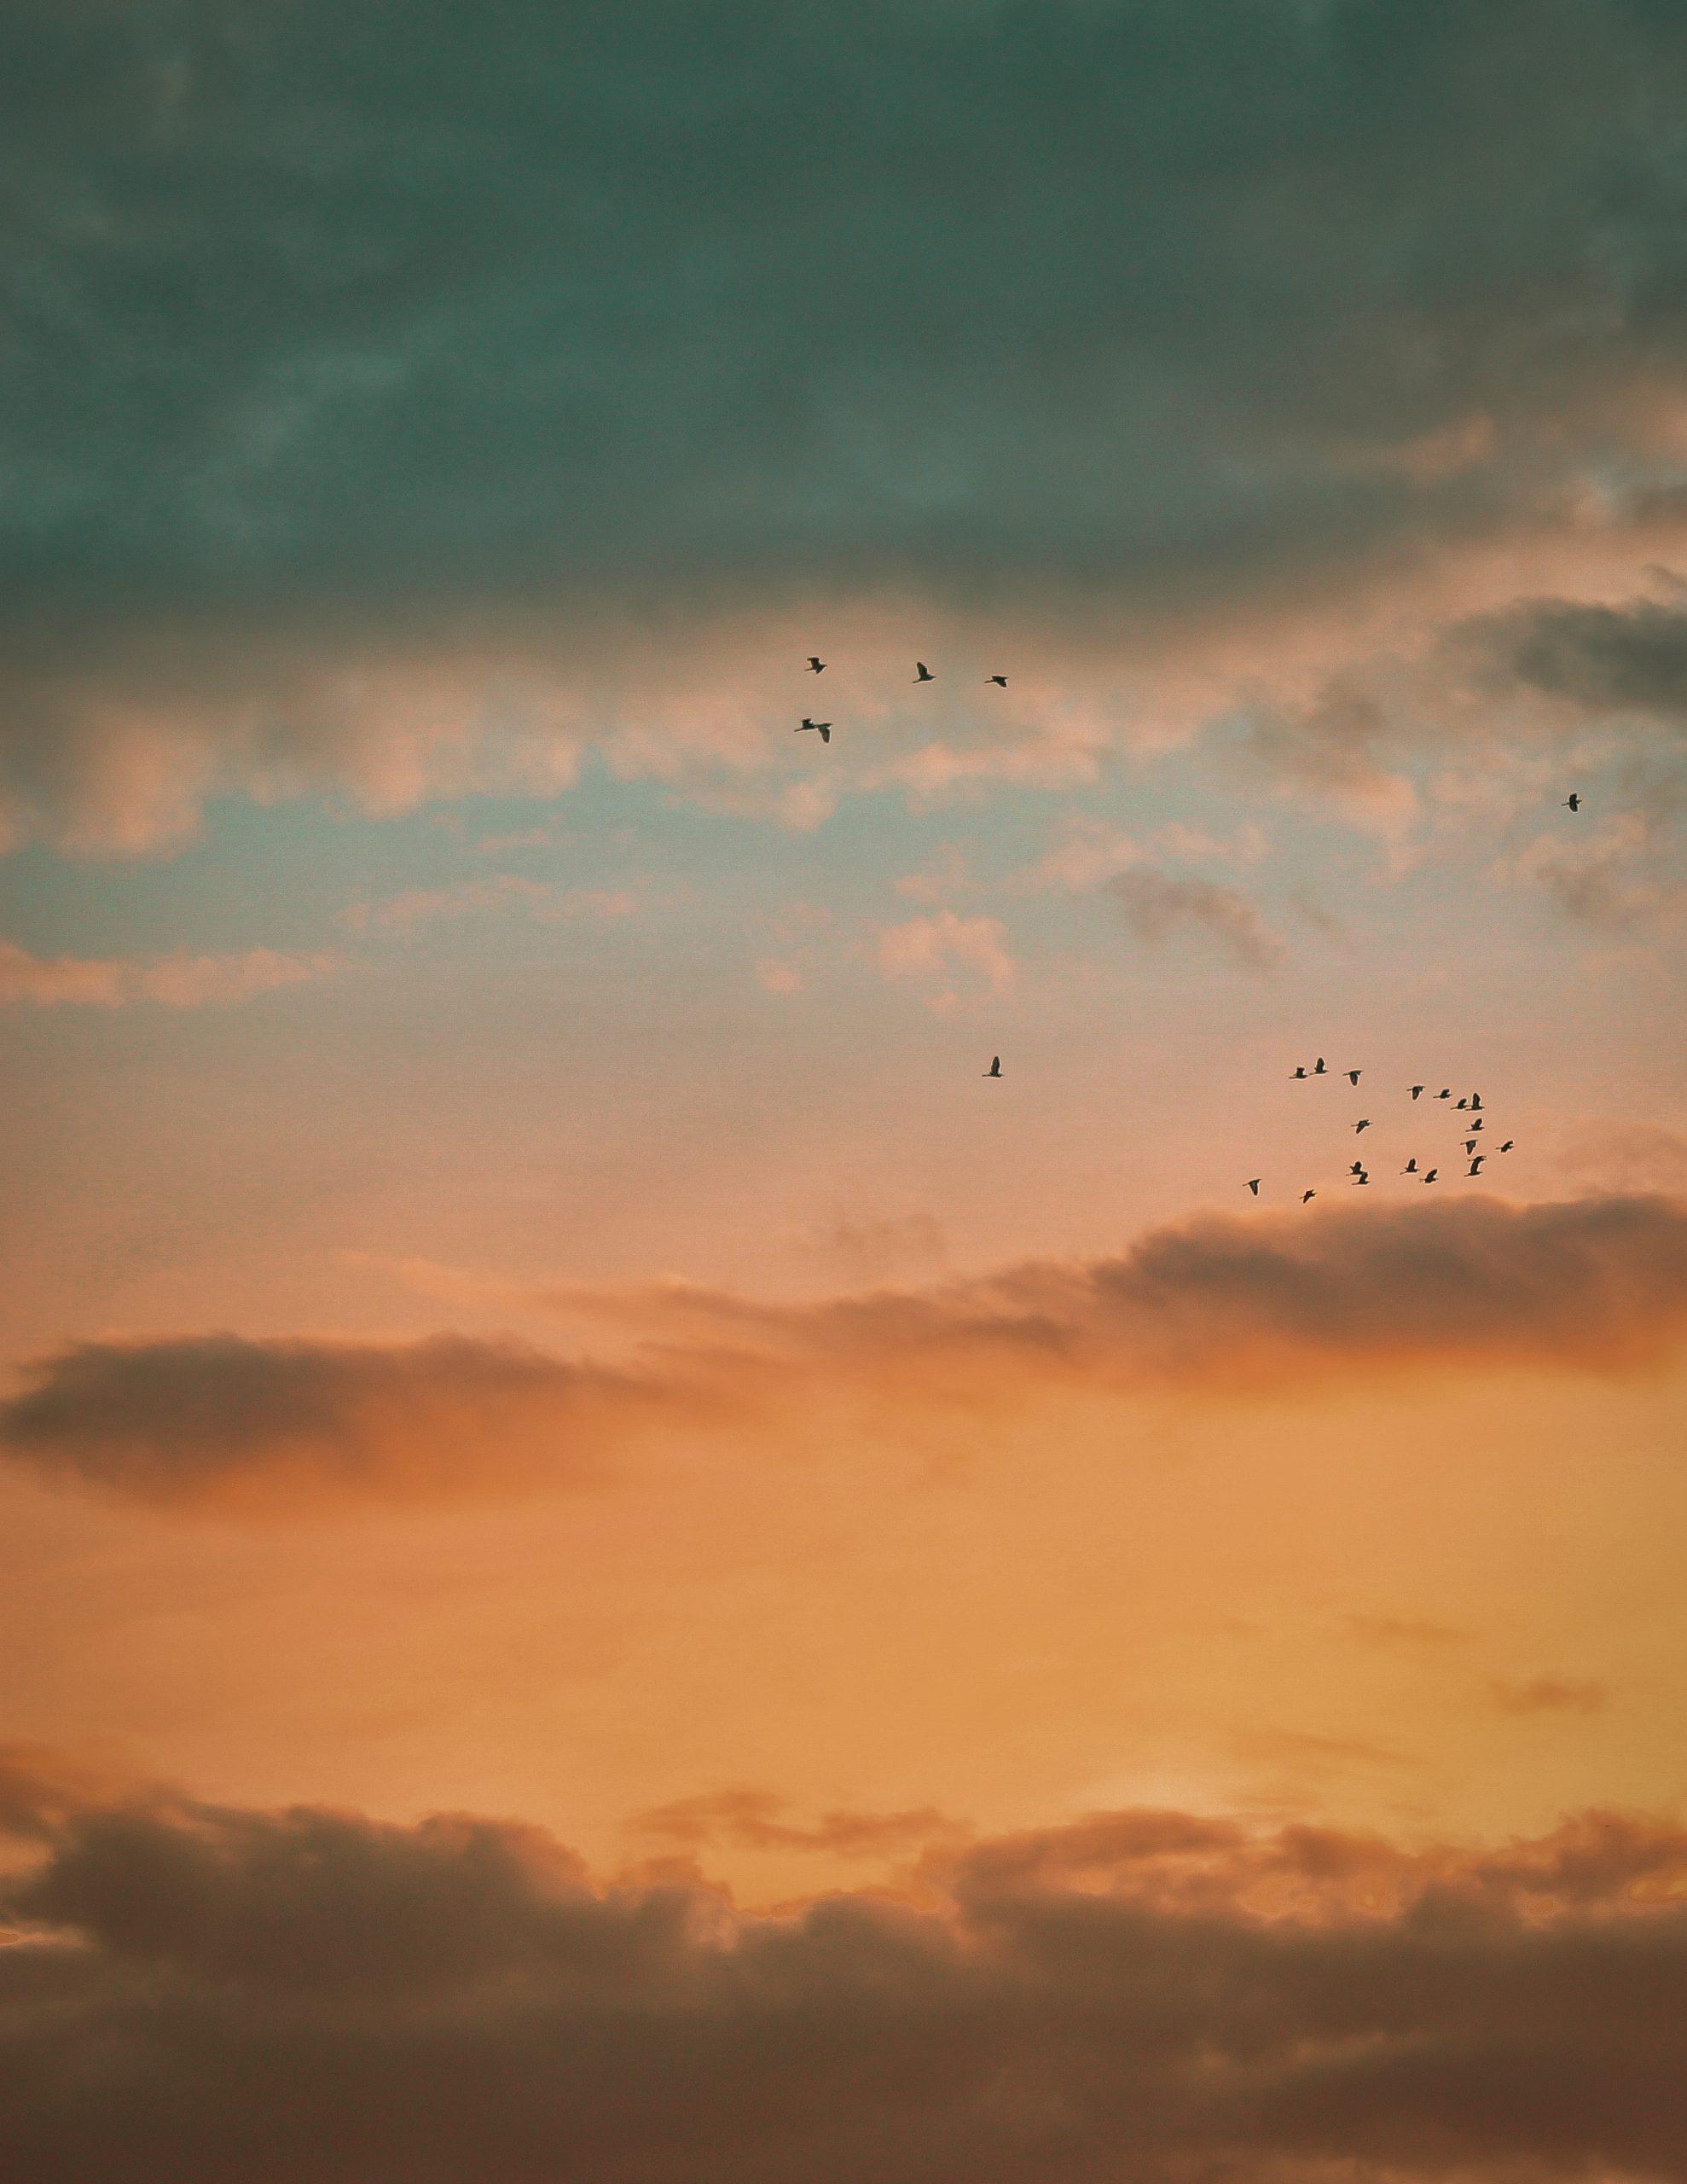 A flock during evening